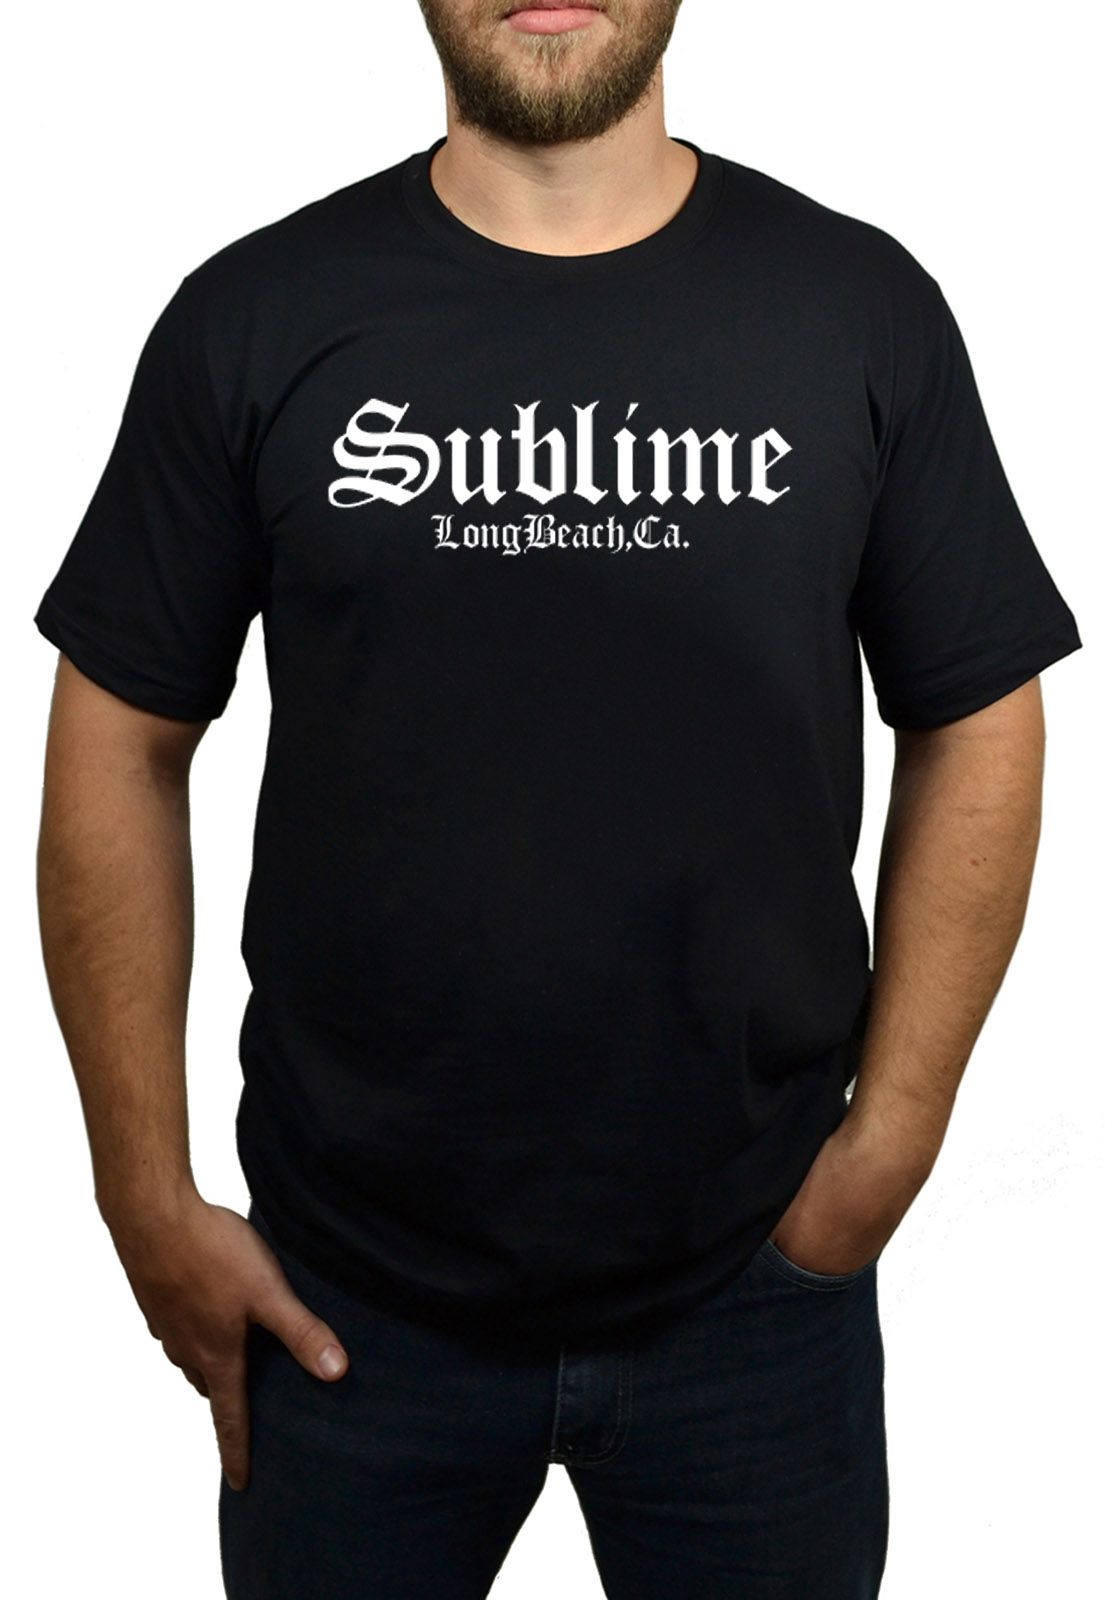 Camiseta Sublime Long Beach Preto  - HShop